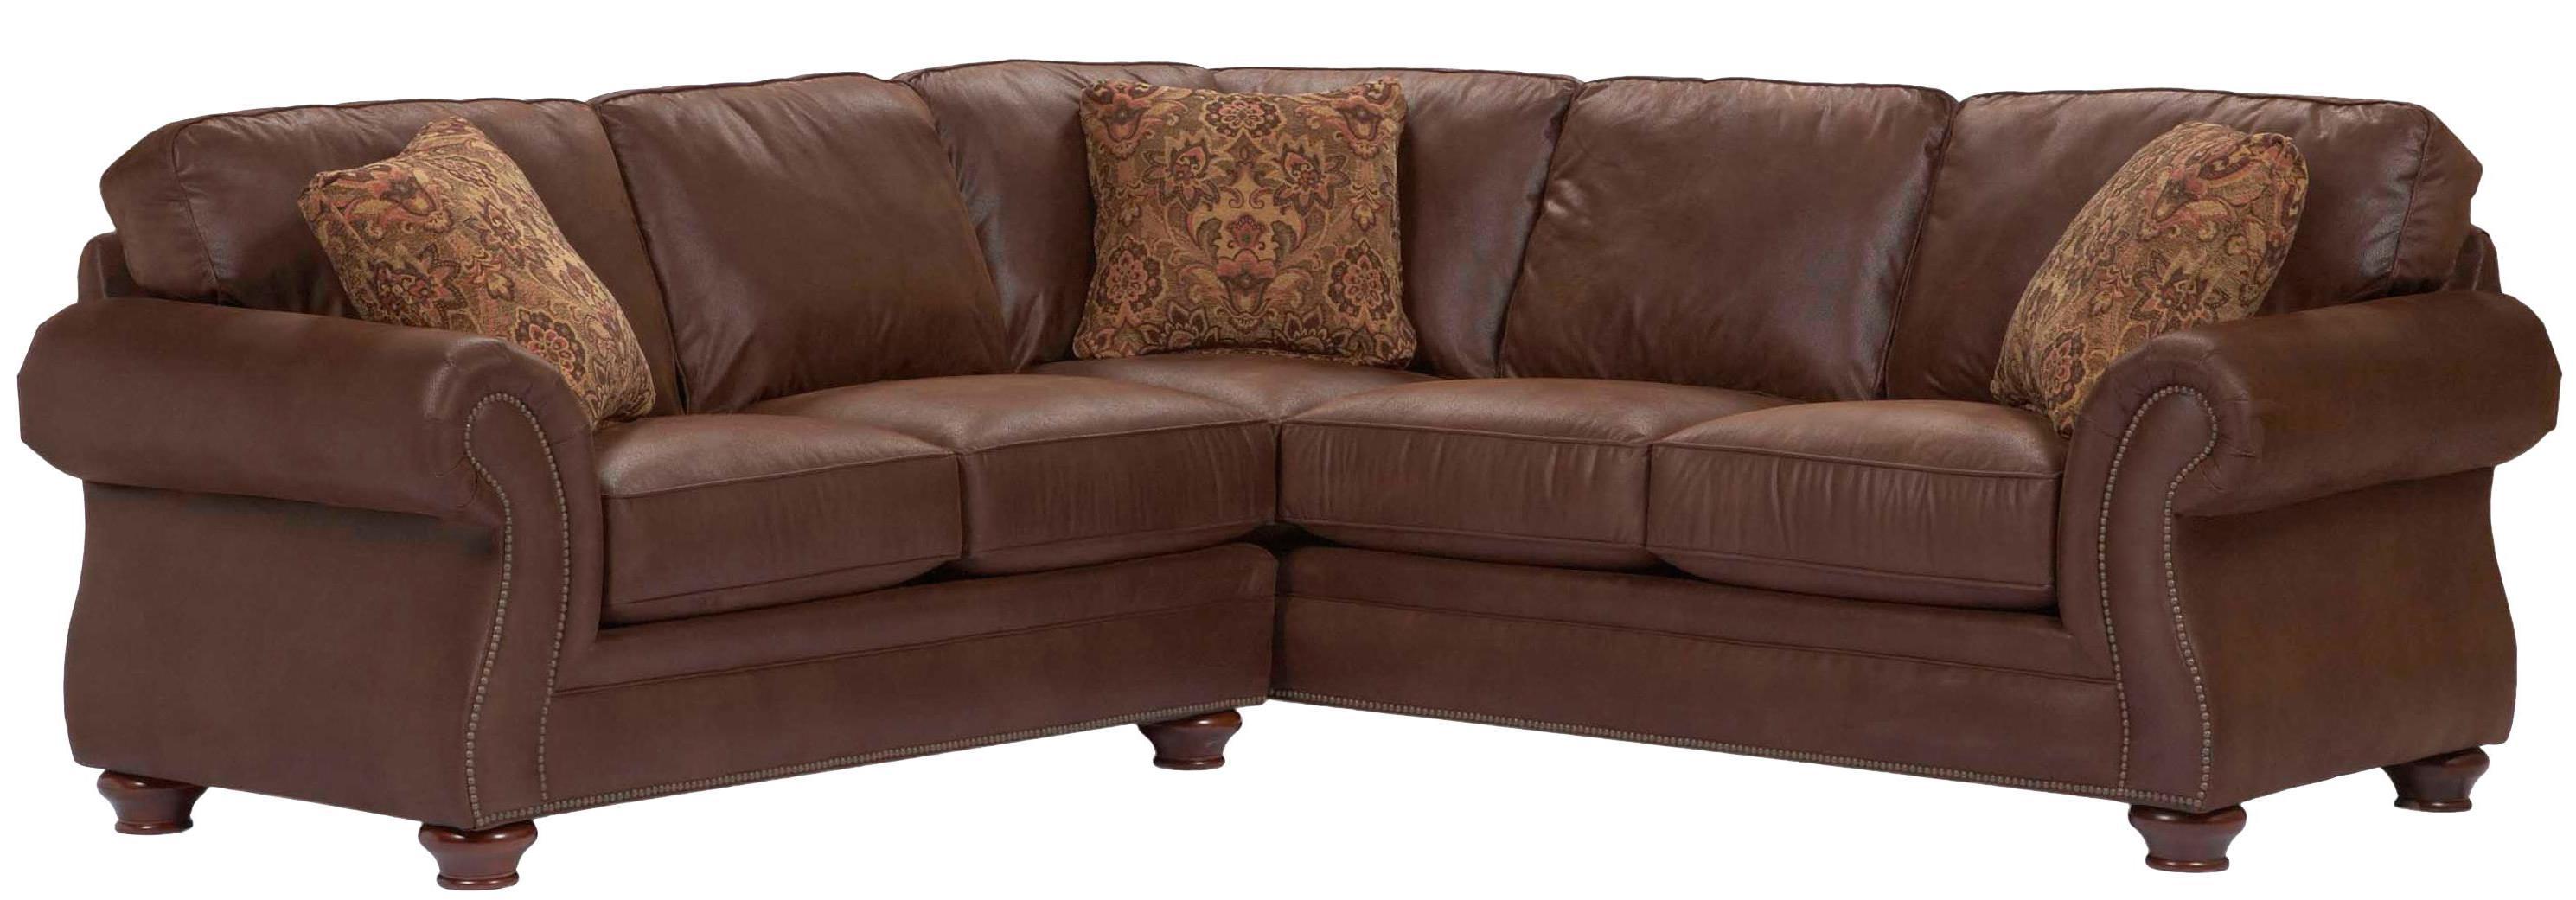 broyhill furniture laramie 2 piece corner sectional sofa JZXF2GIE